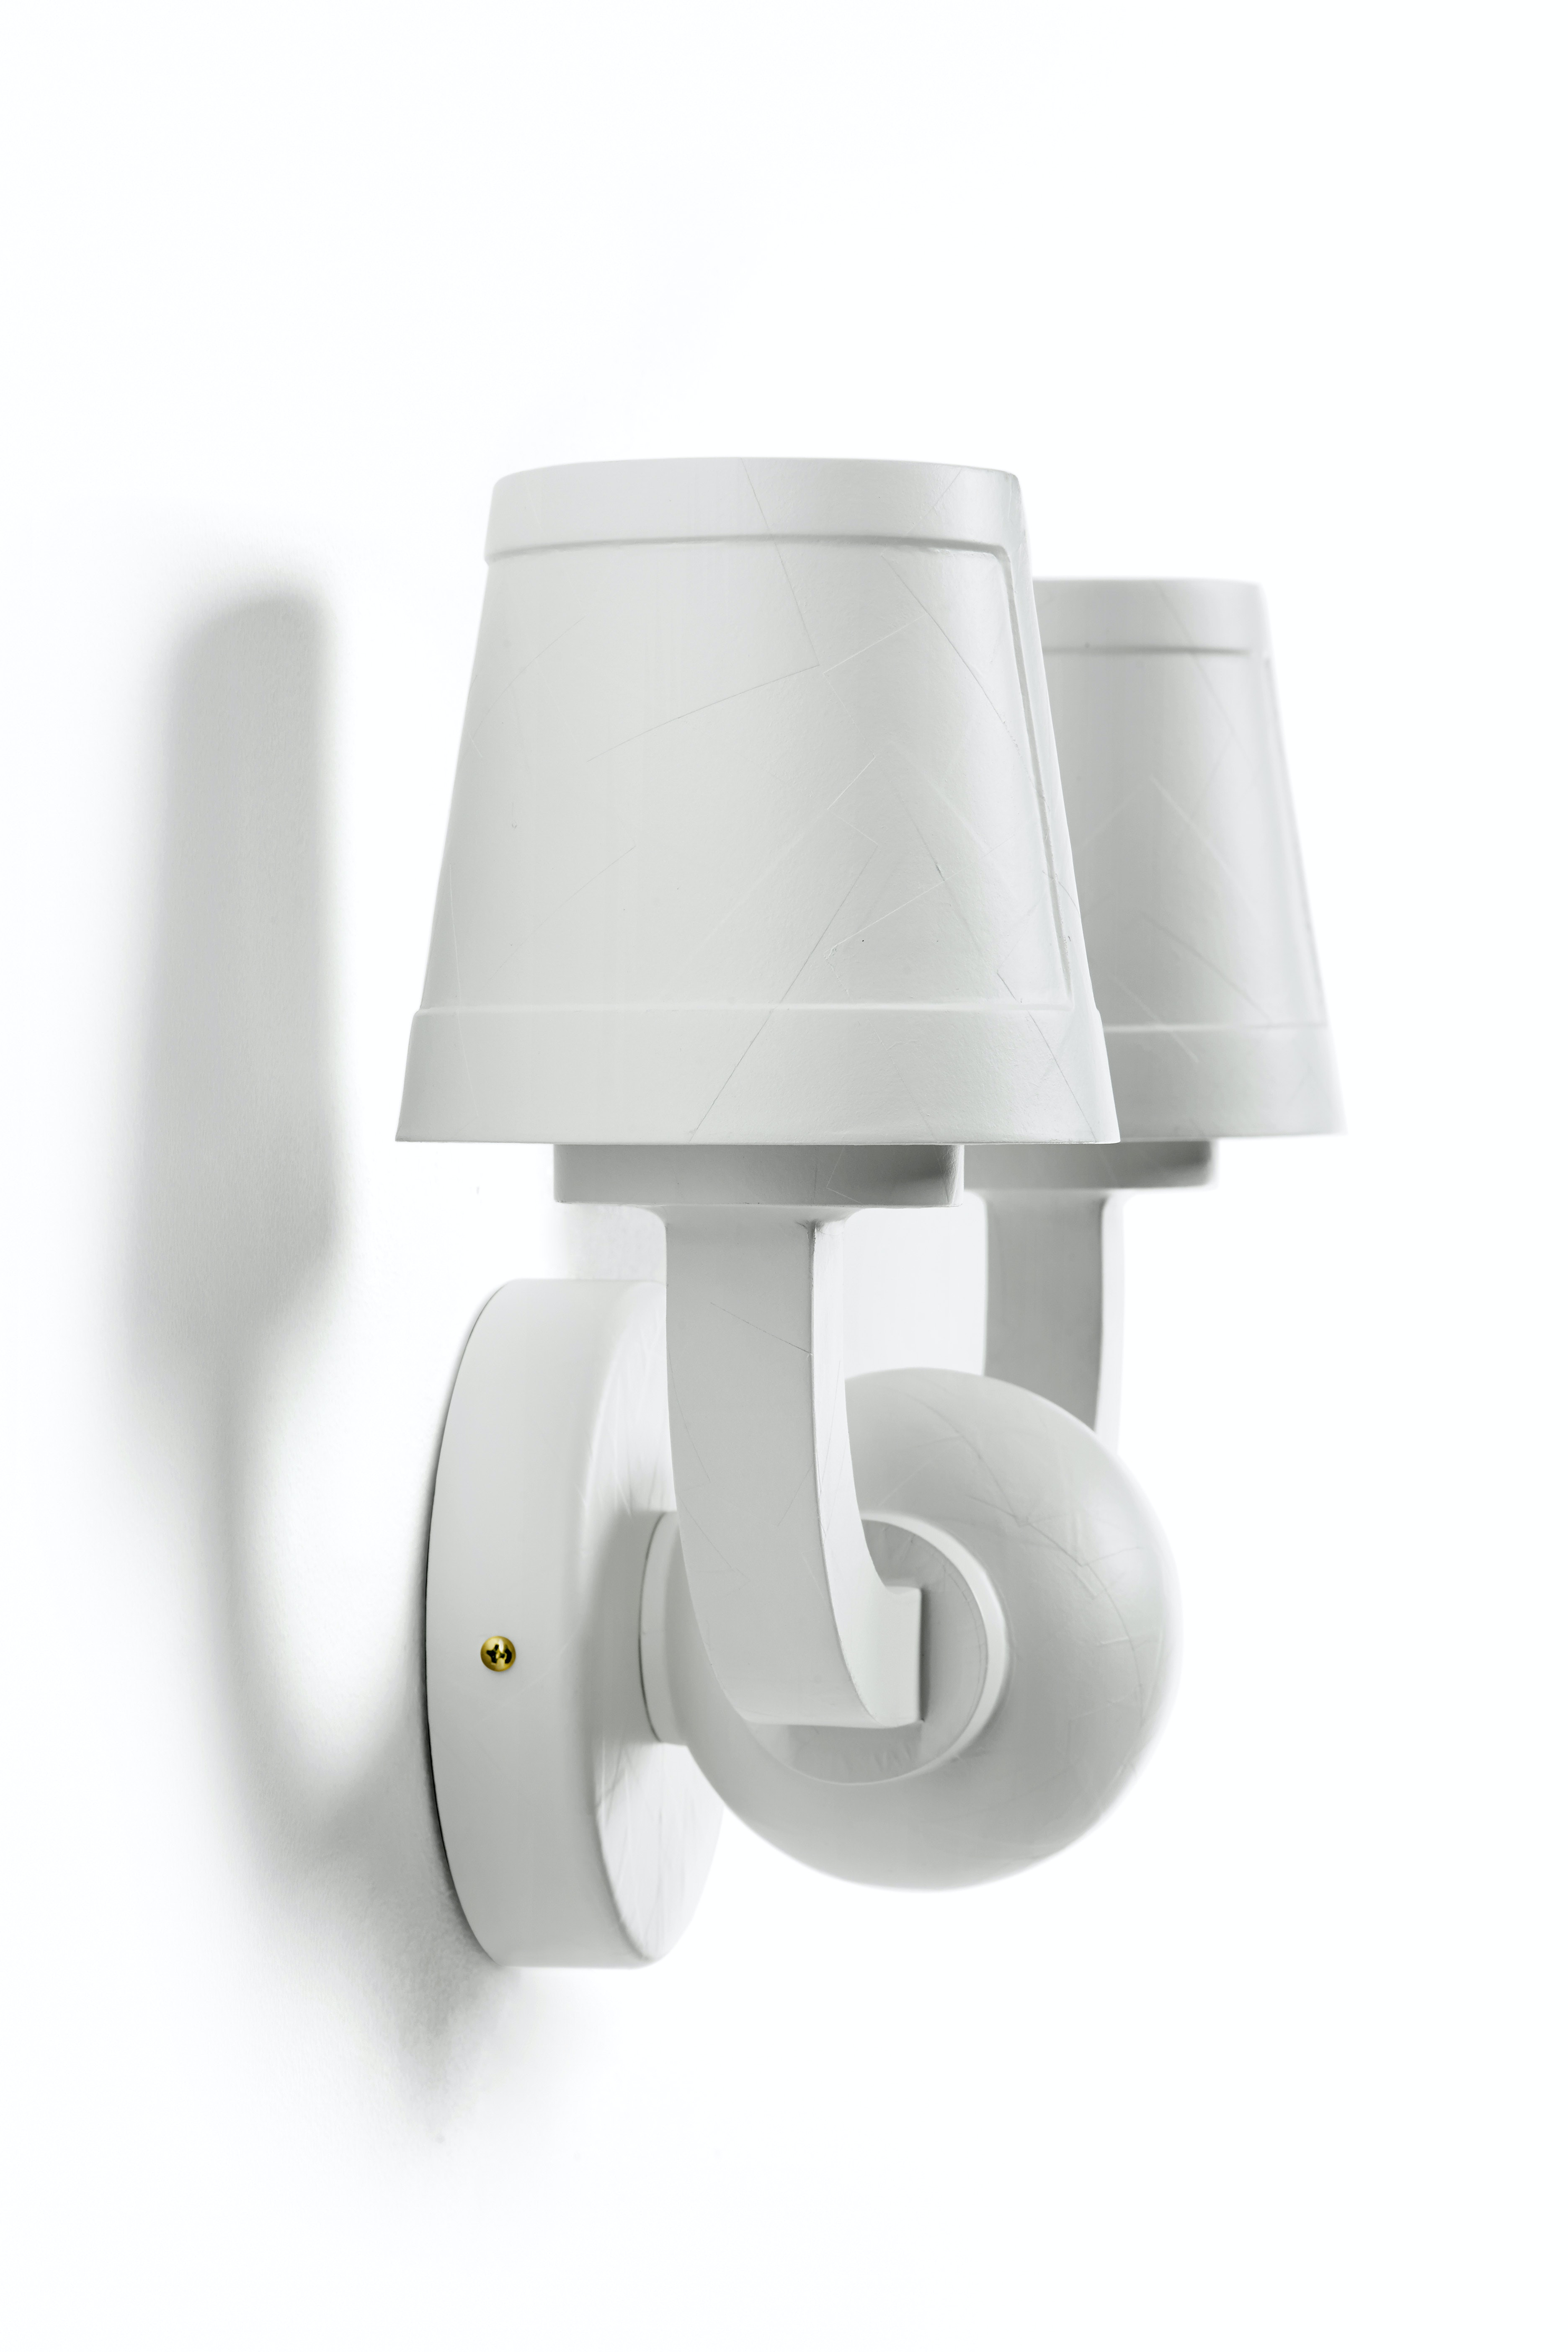 Paper Wall Lamp By Studio Job For Moooi 3 300Dpi Moooi